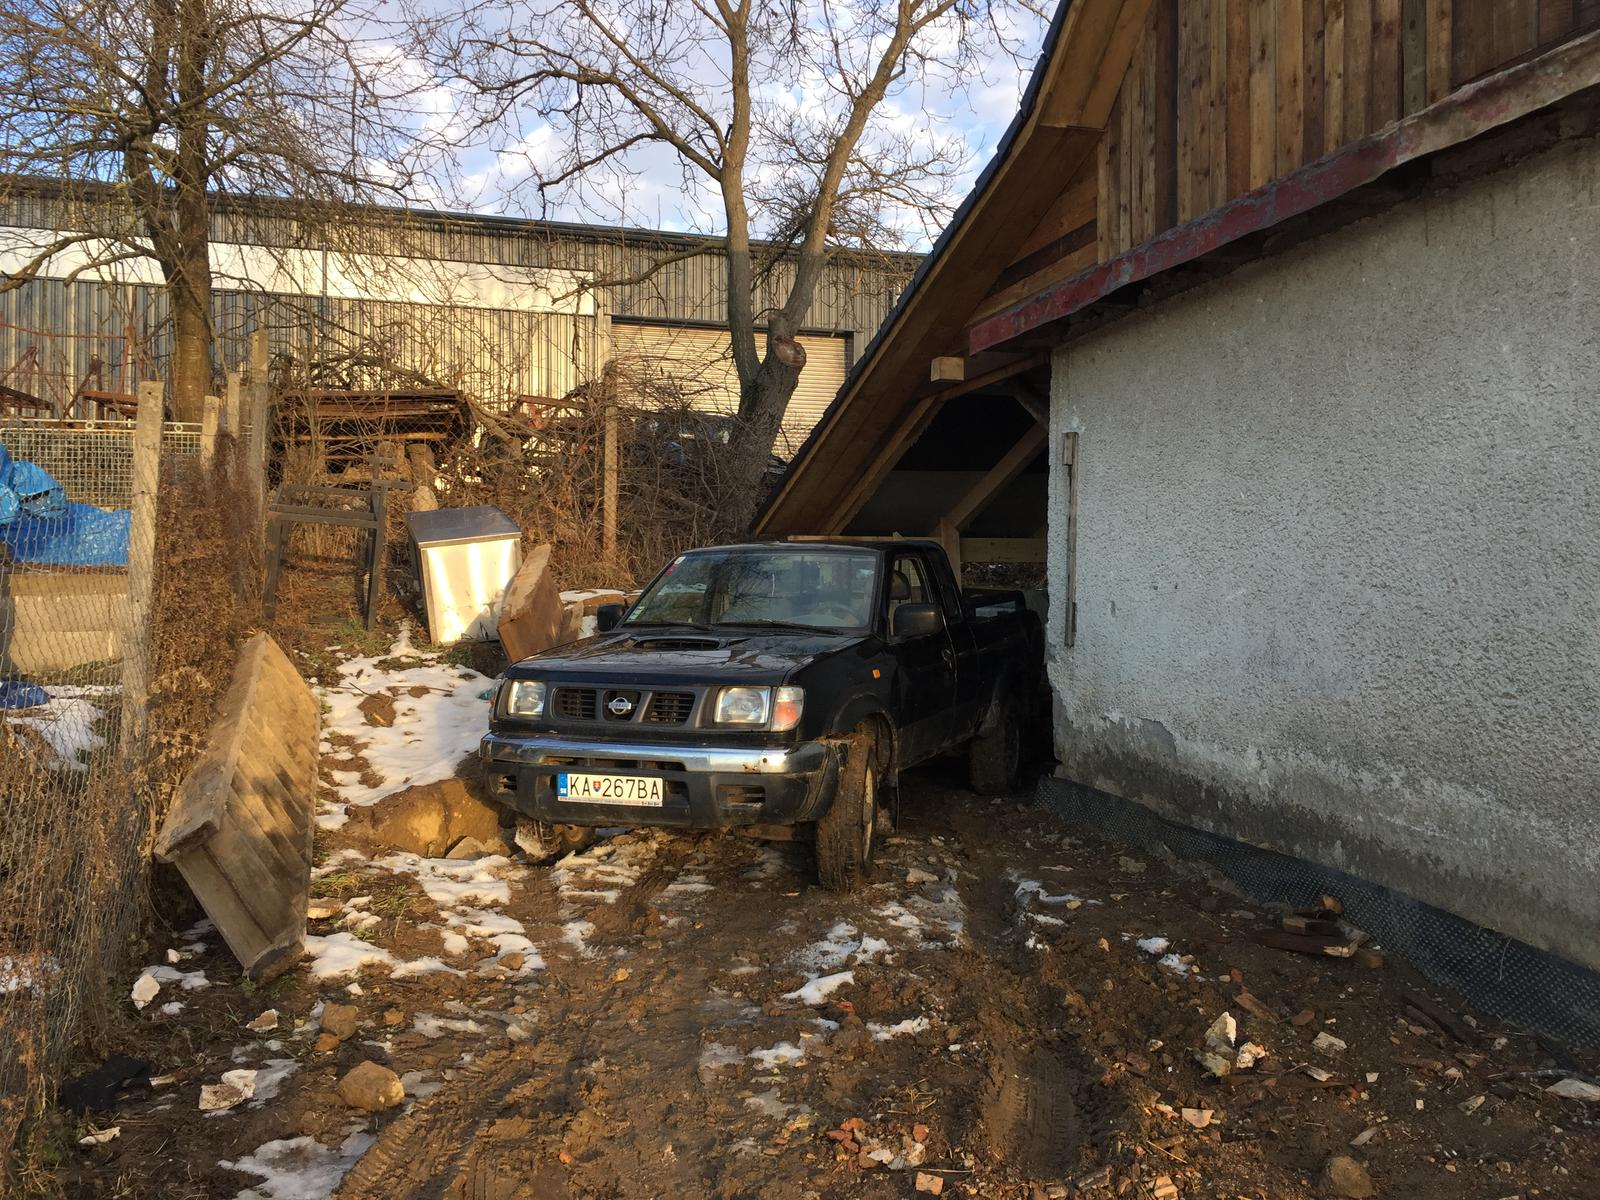 HACIENDA NAPOLI SEBECHLEBY - Material si uz vozim pod suche